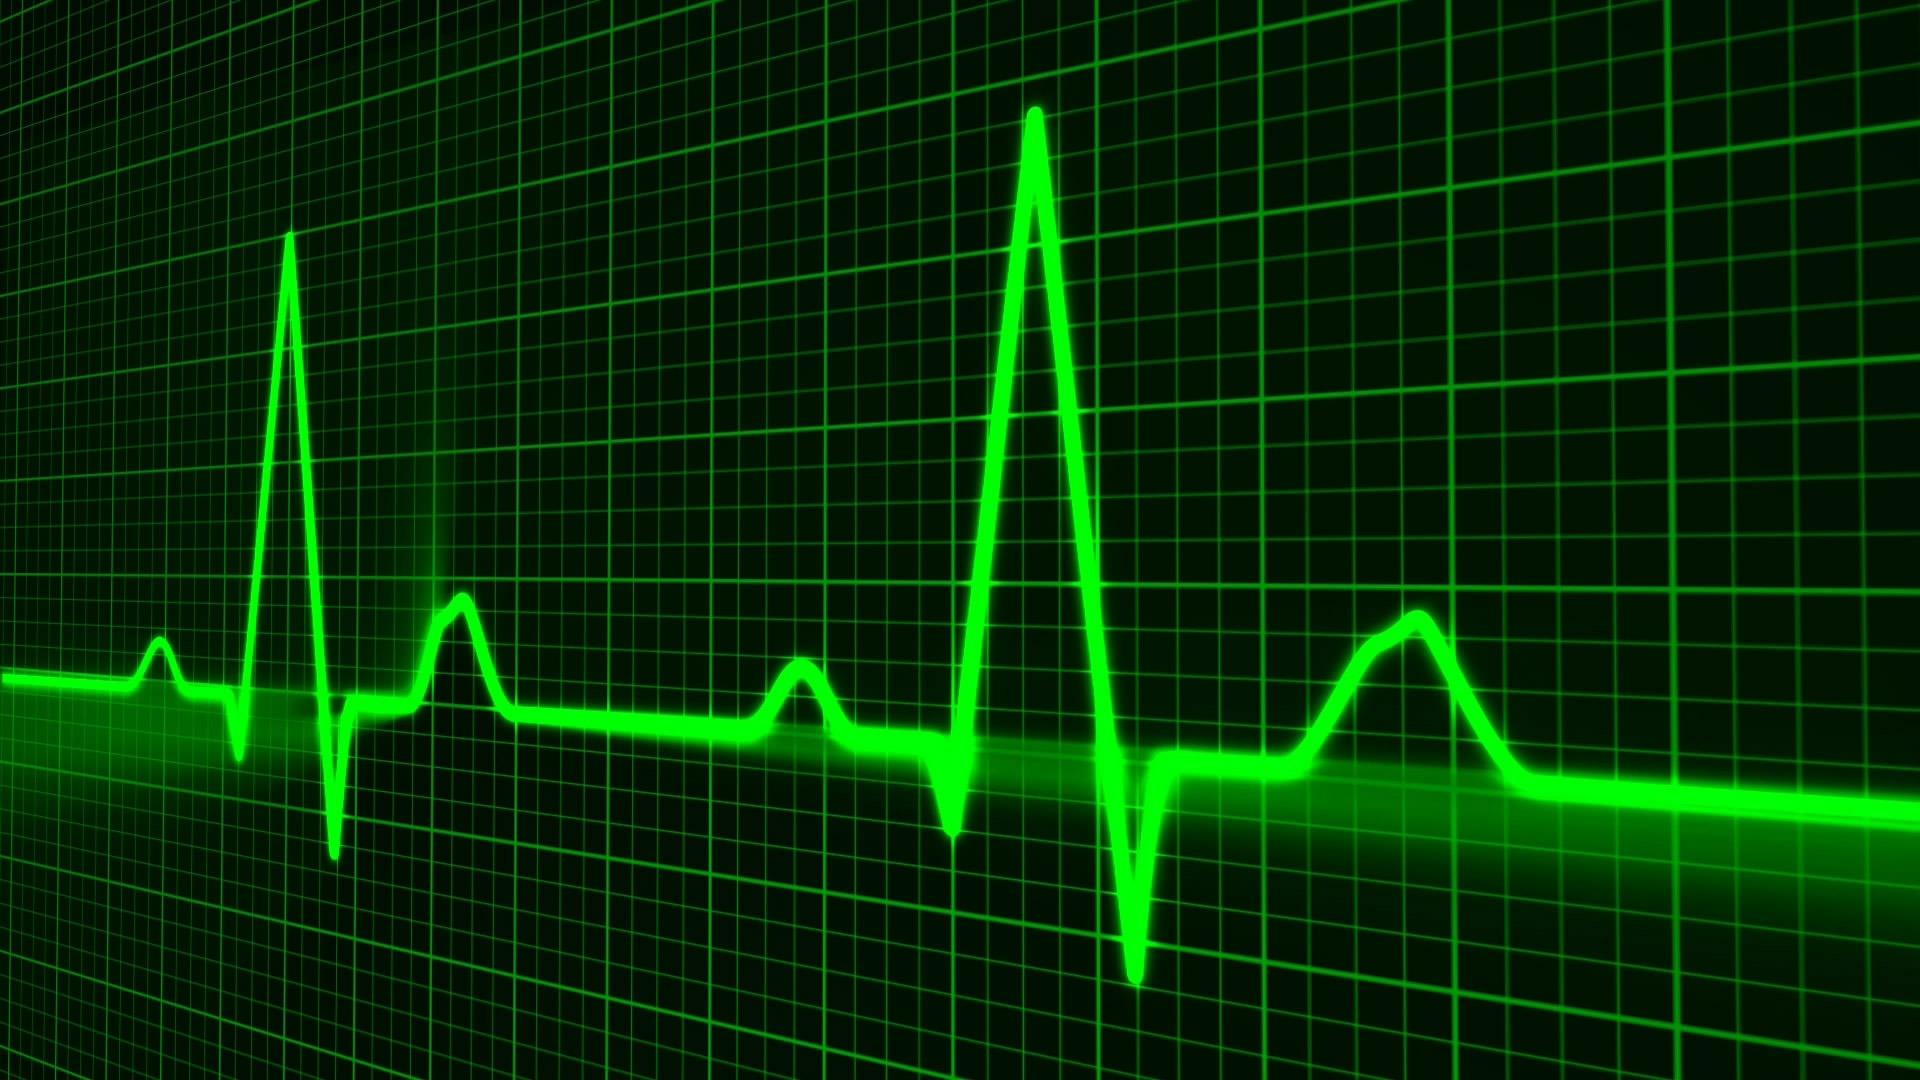 Impulsion, rythme, cardiogramme, Oscilloscope, coeur - Fonds d'écran HD - Professor-falken.com